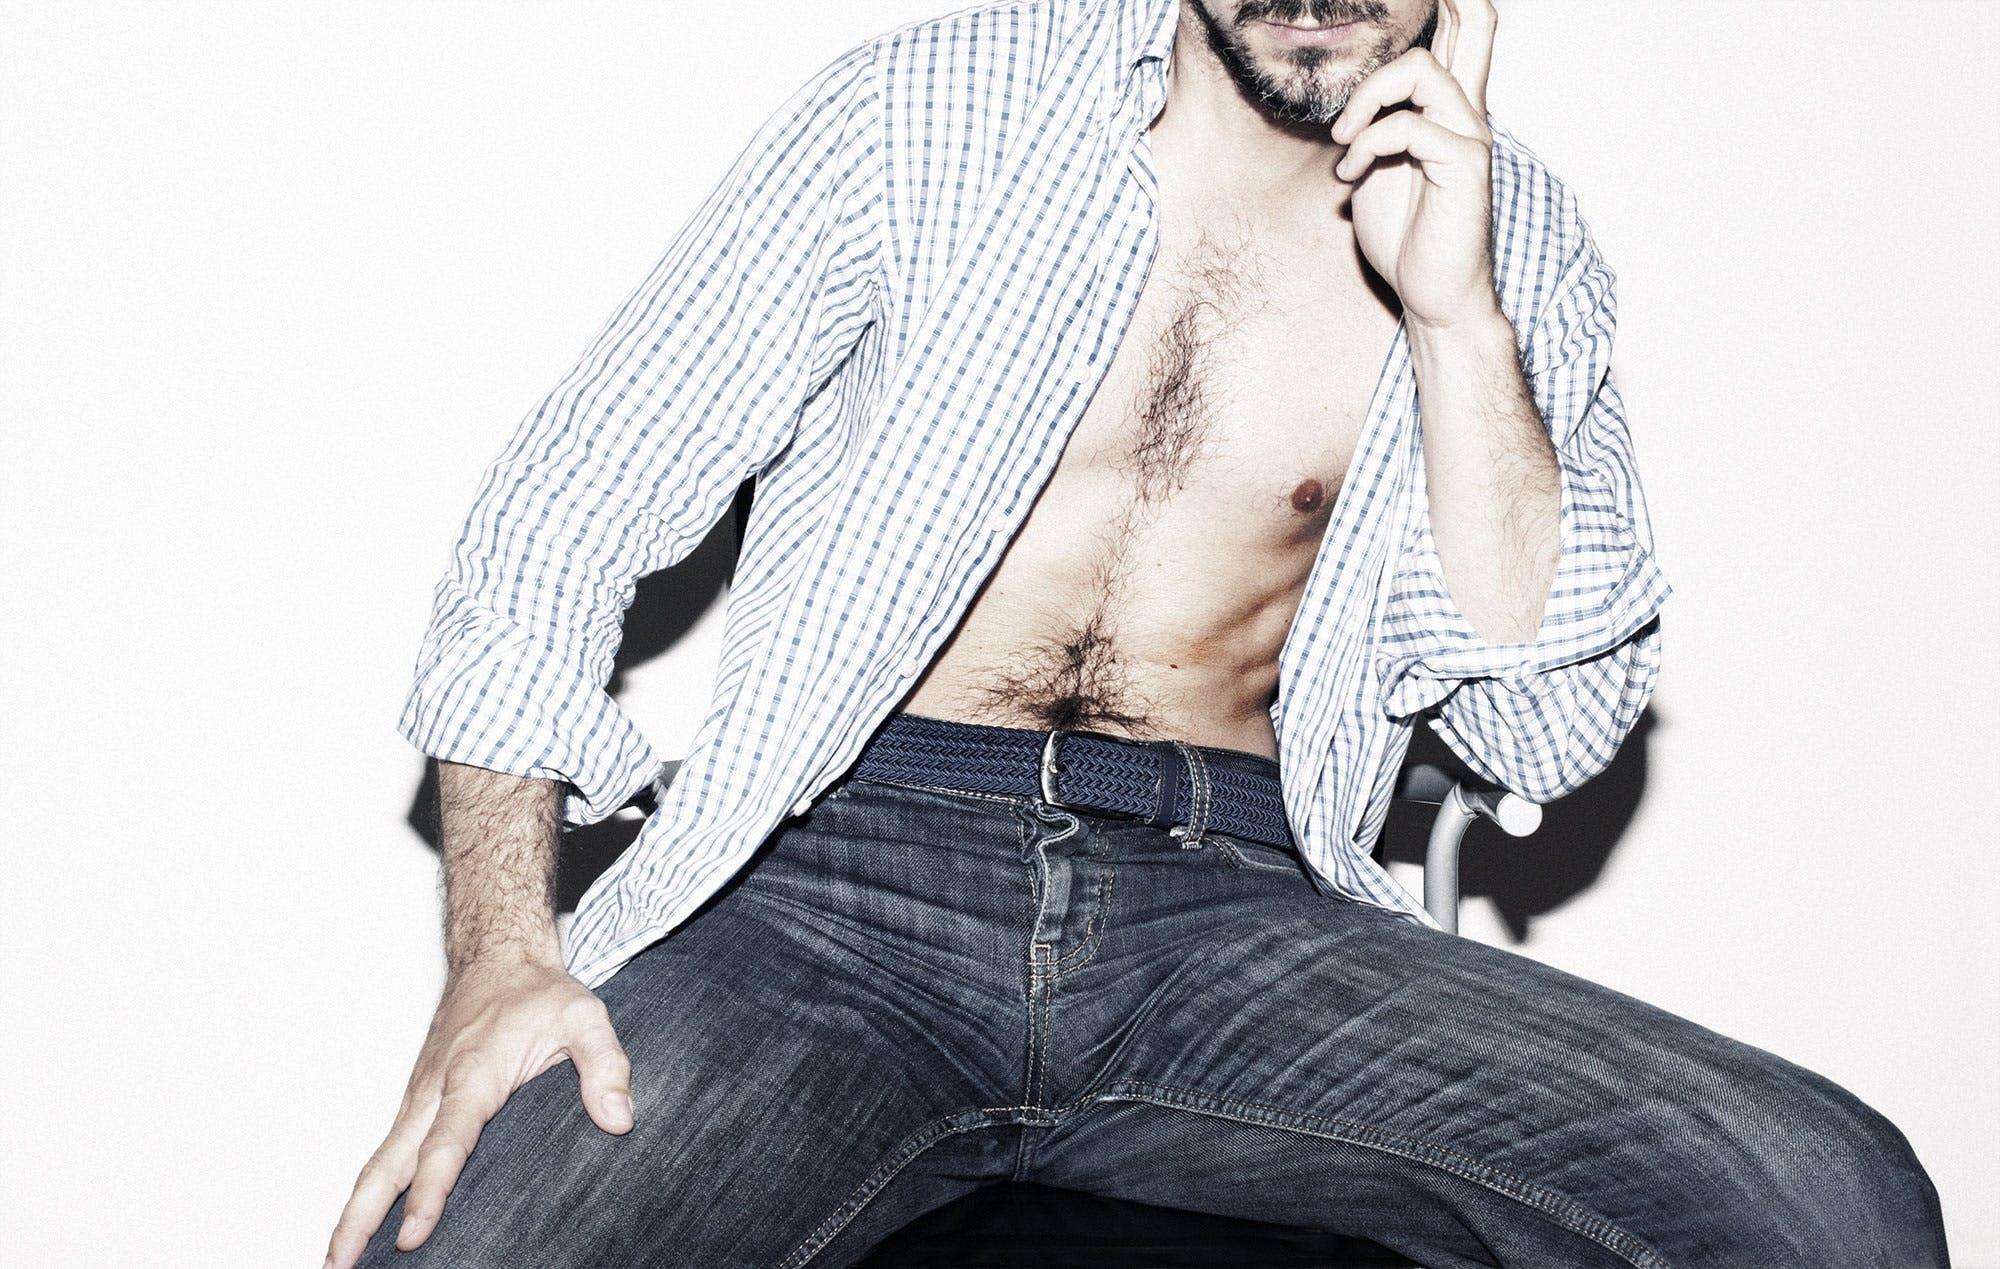 Man in Black White Gingham Dress Shirt and Blue Denim Jeans